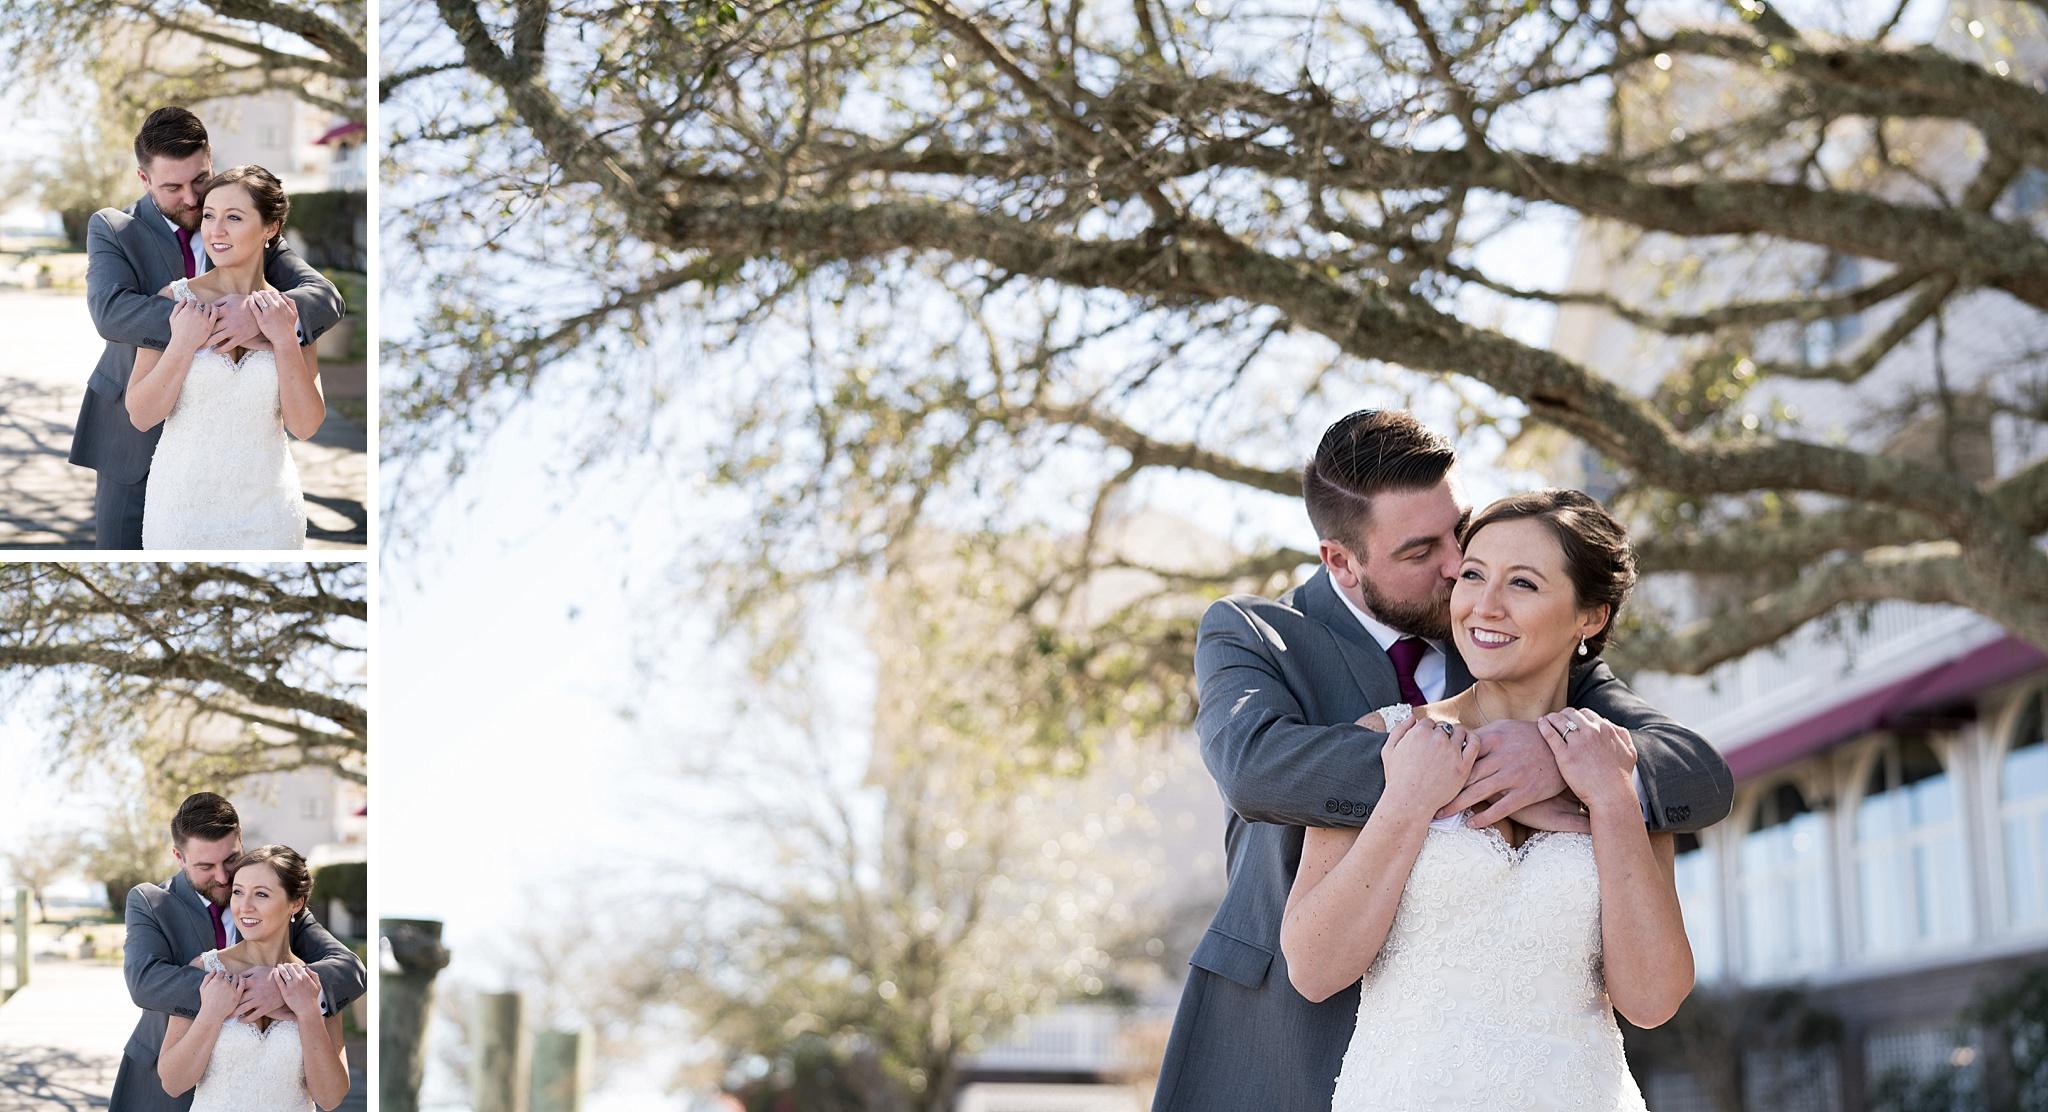 Manteo-NC-Wedding-Photographer-125.jpg